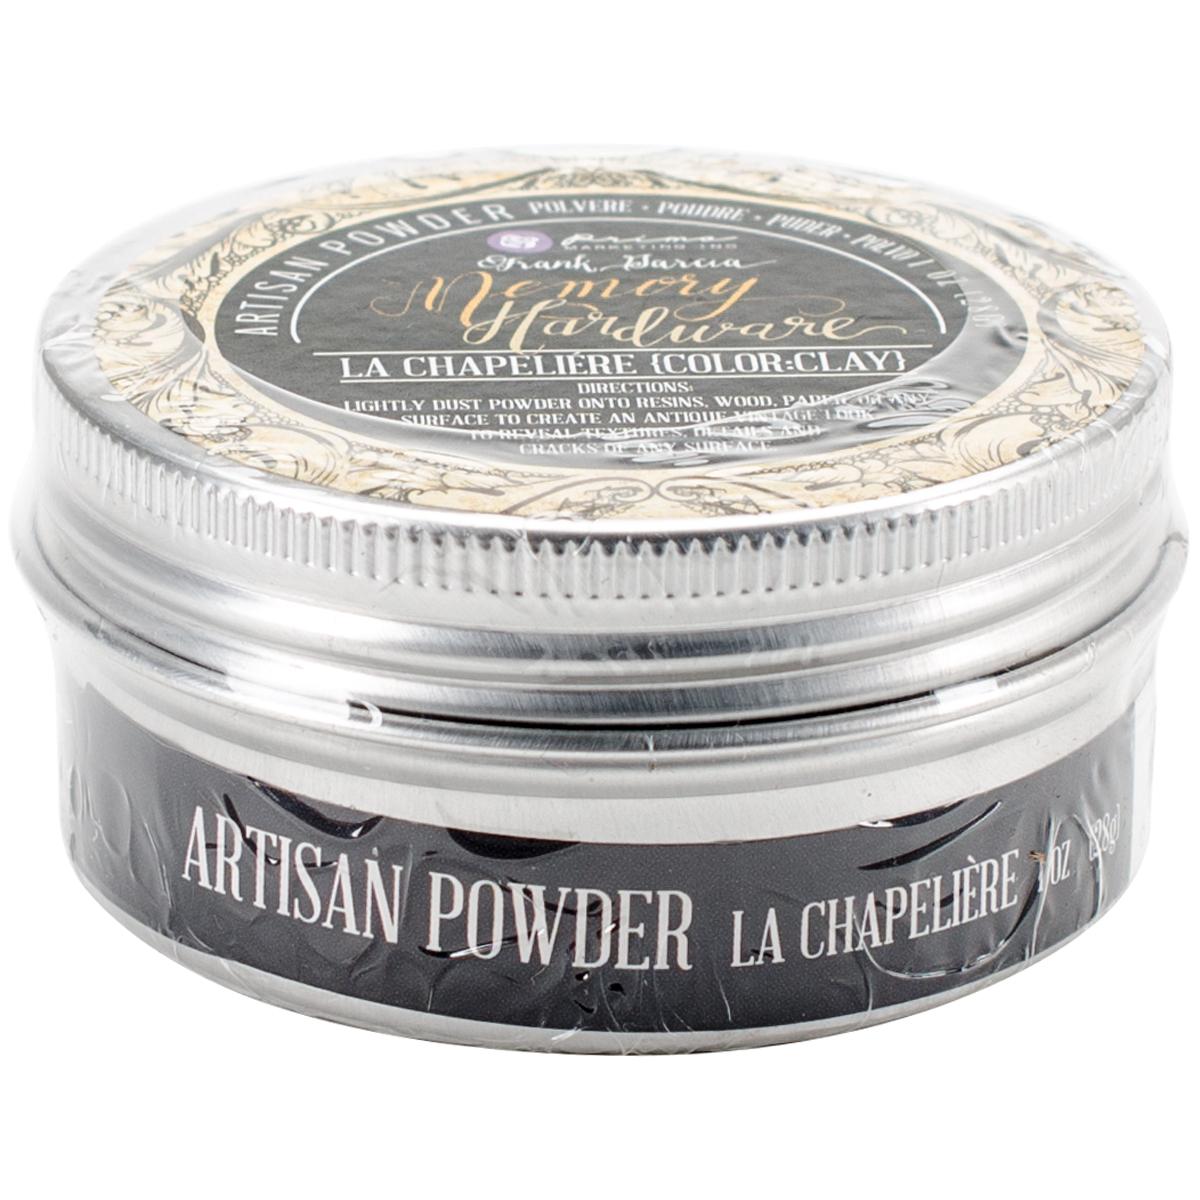 Artisan Powder Clay